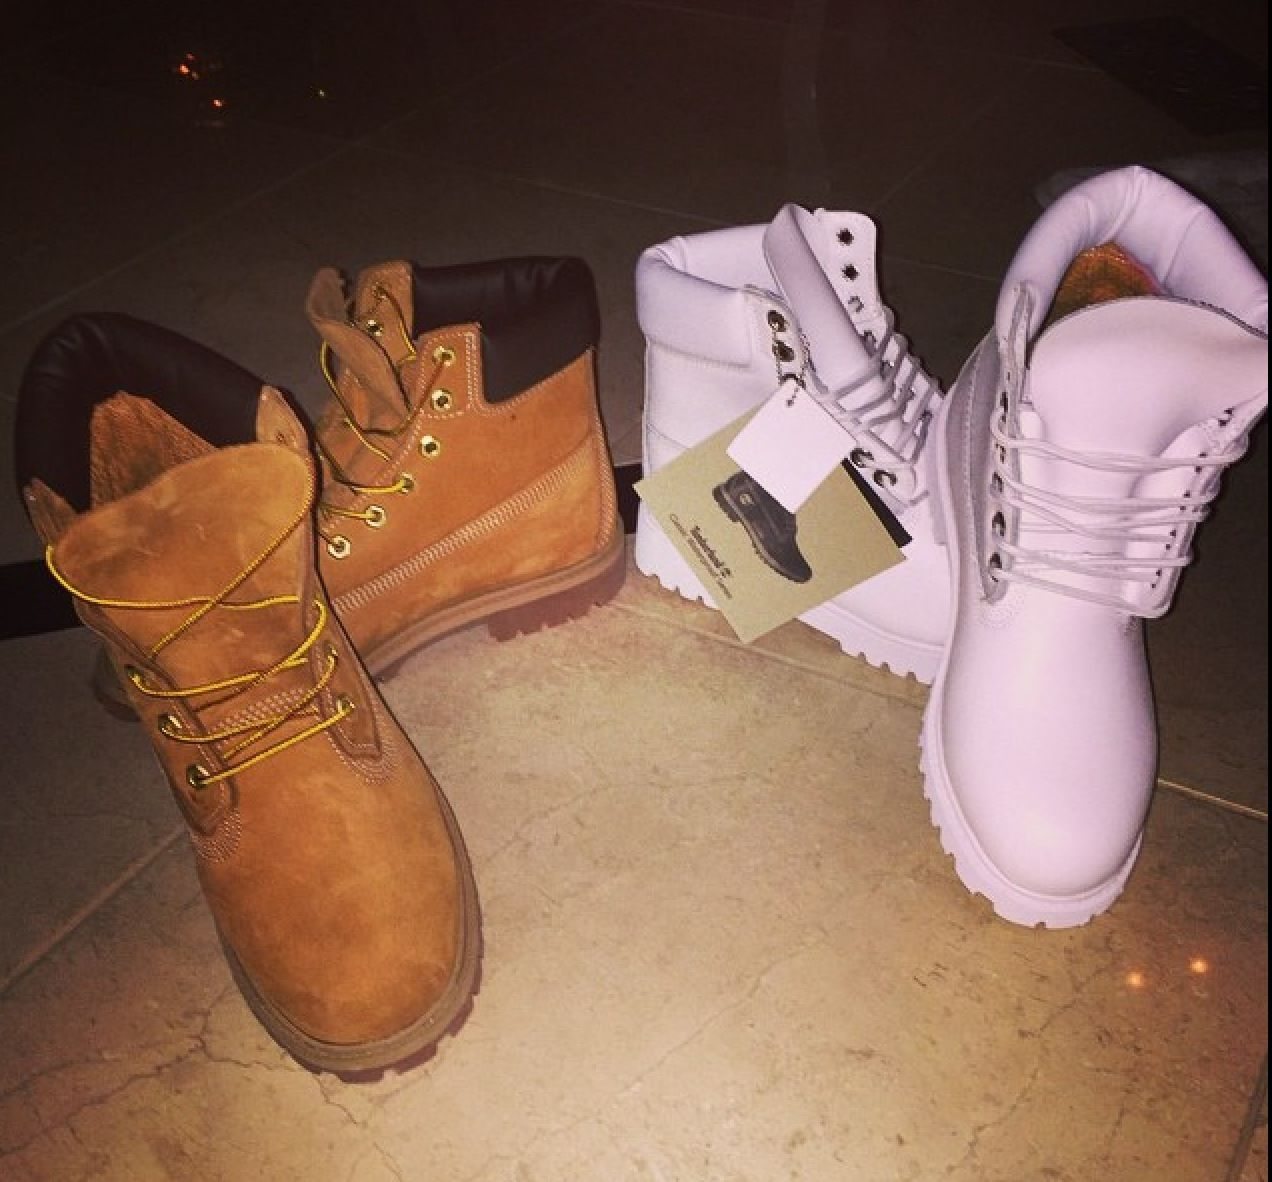 Boots … Hisamp; amp; Timberland ༝༚❤༝༚ Hers m80NwvynO